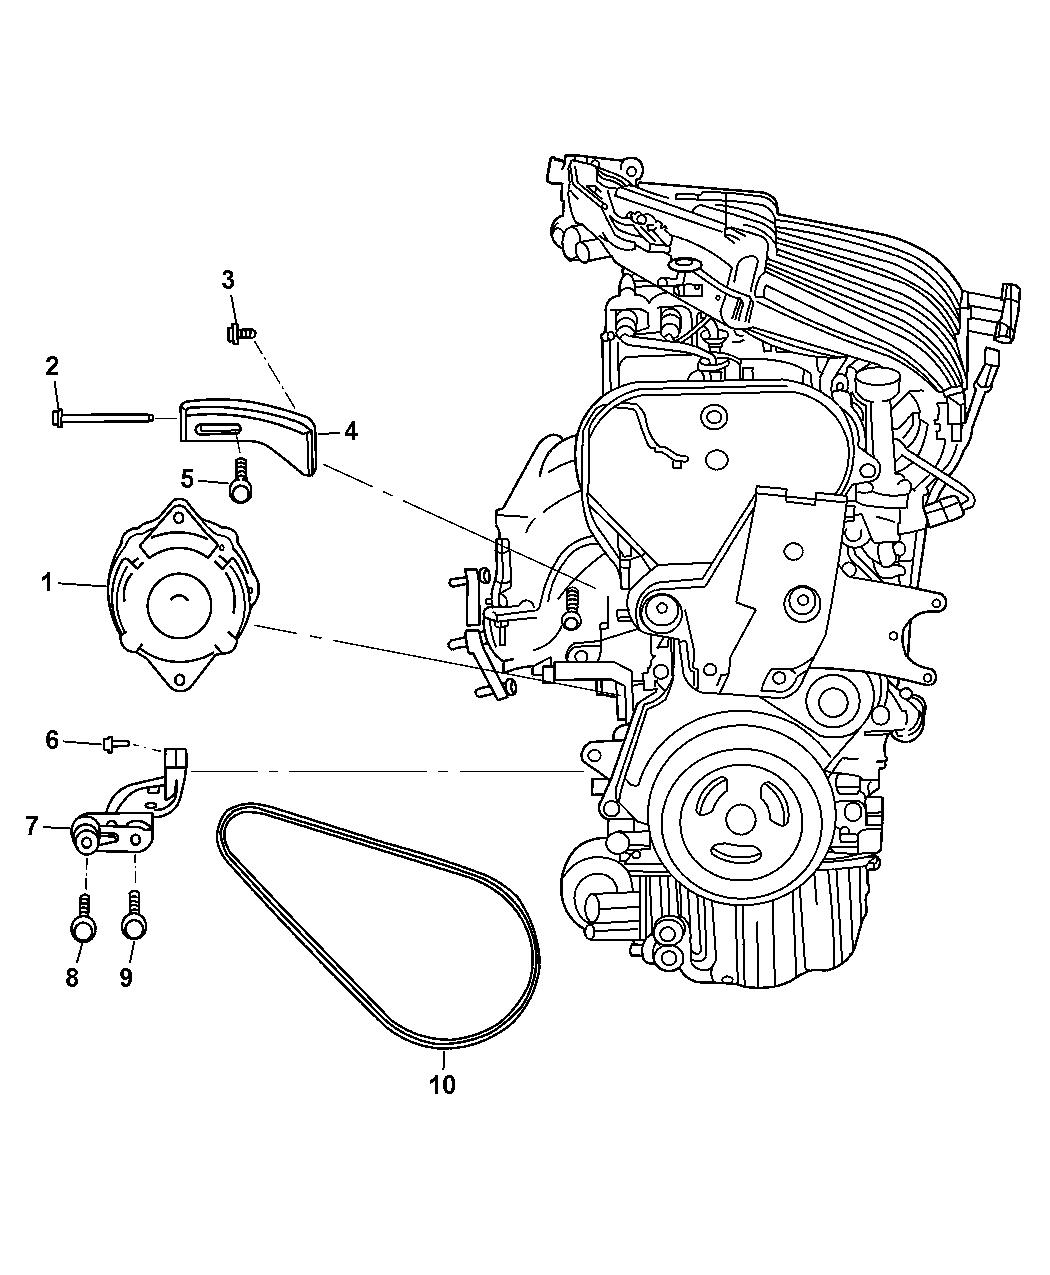 Engine Of A 2005 Pt Cruiser Gt Convertible